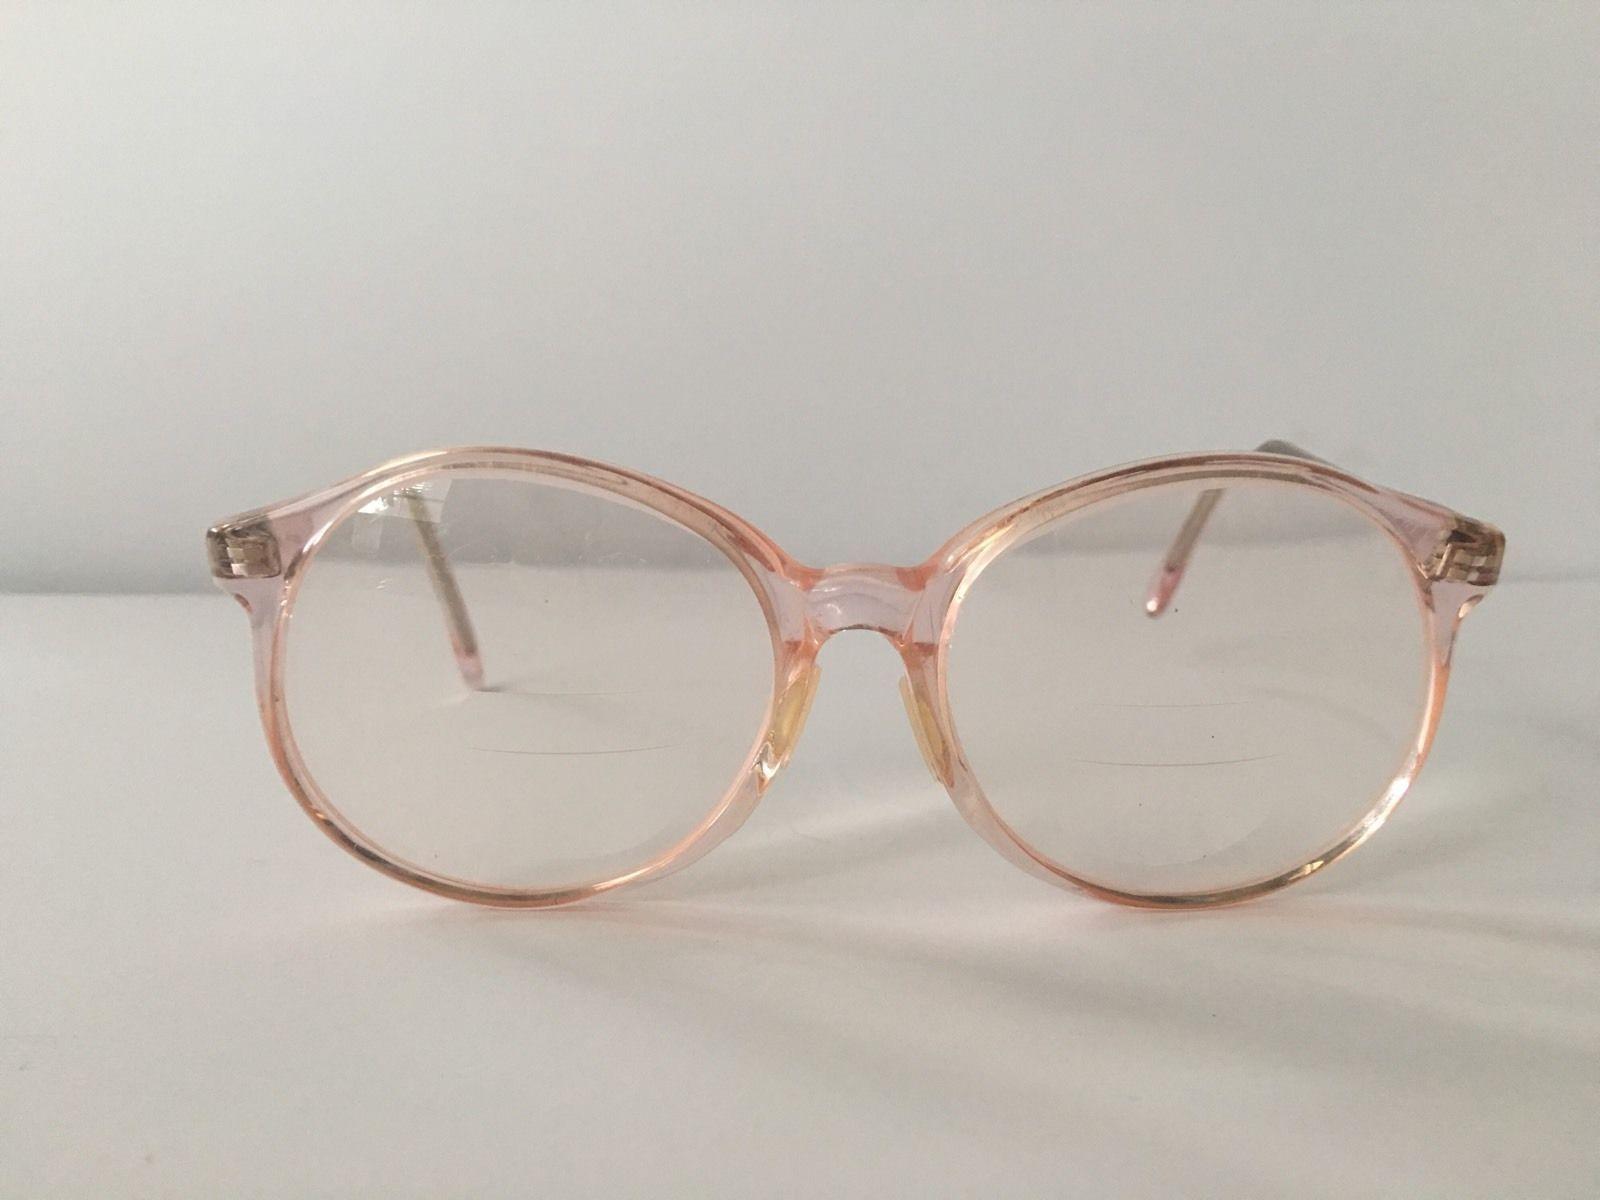 Vintage Hipster Peach Eyeglasses by Pathways Optone Made ...